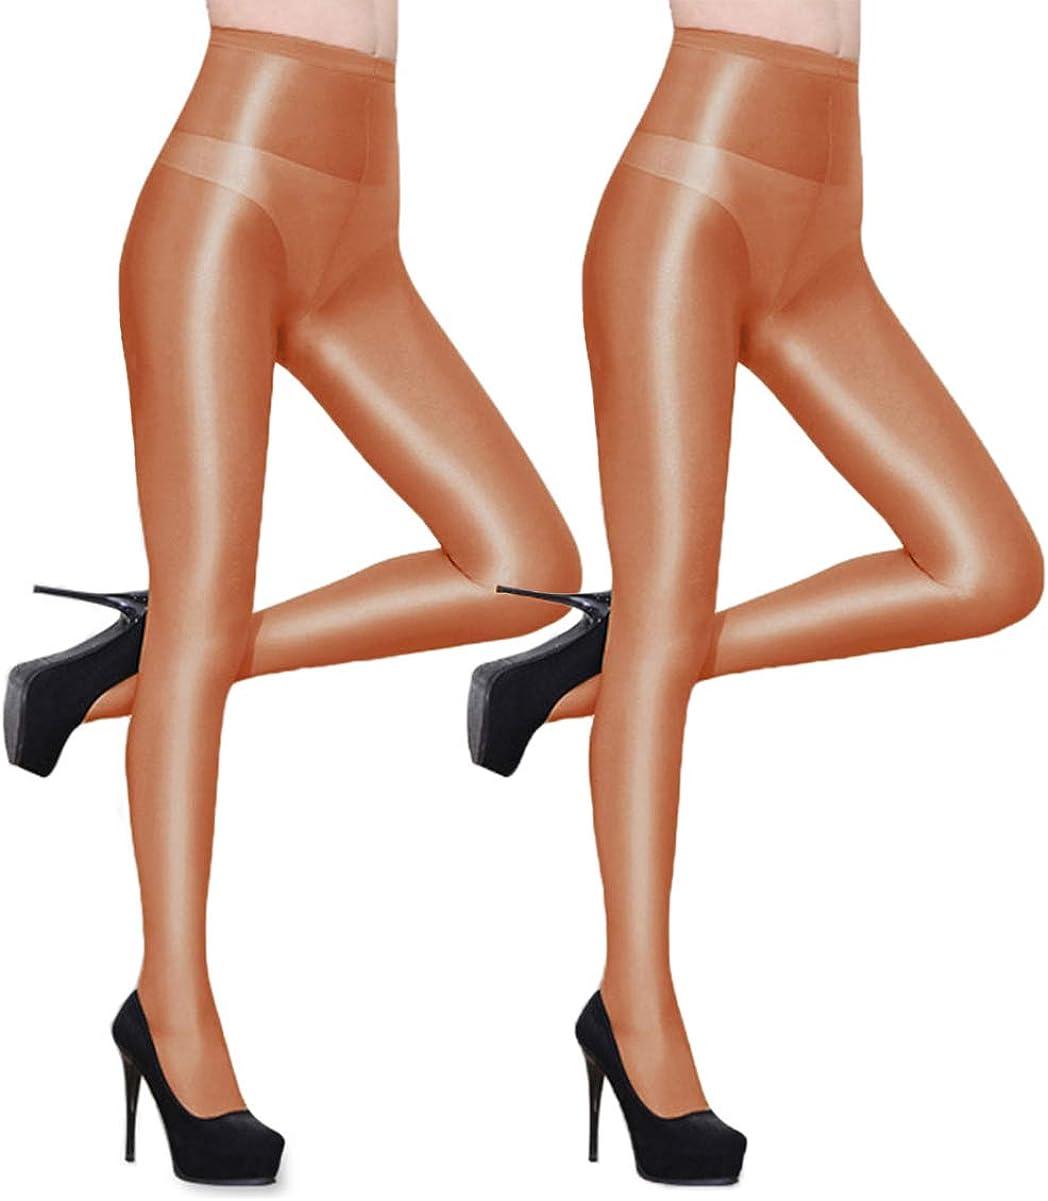 Abberrki Women Sexy Dance Tights Shaping Oil Socks Shiny Silky Sheer Pantyhose - 2 Pairs